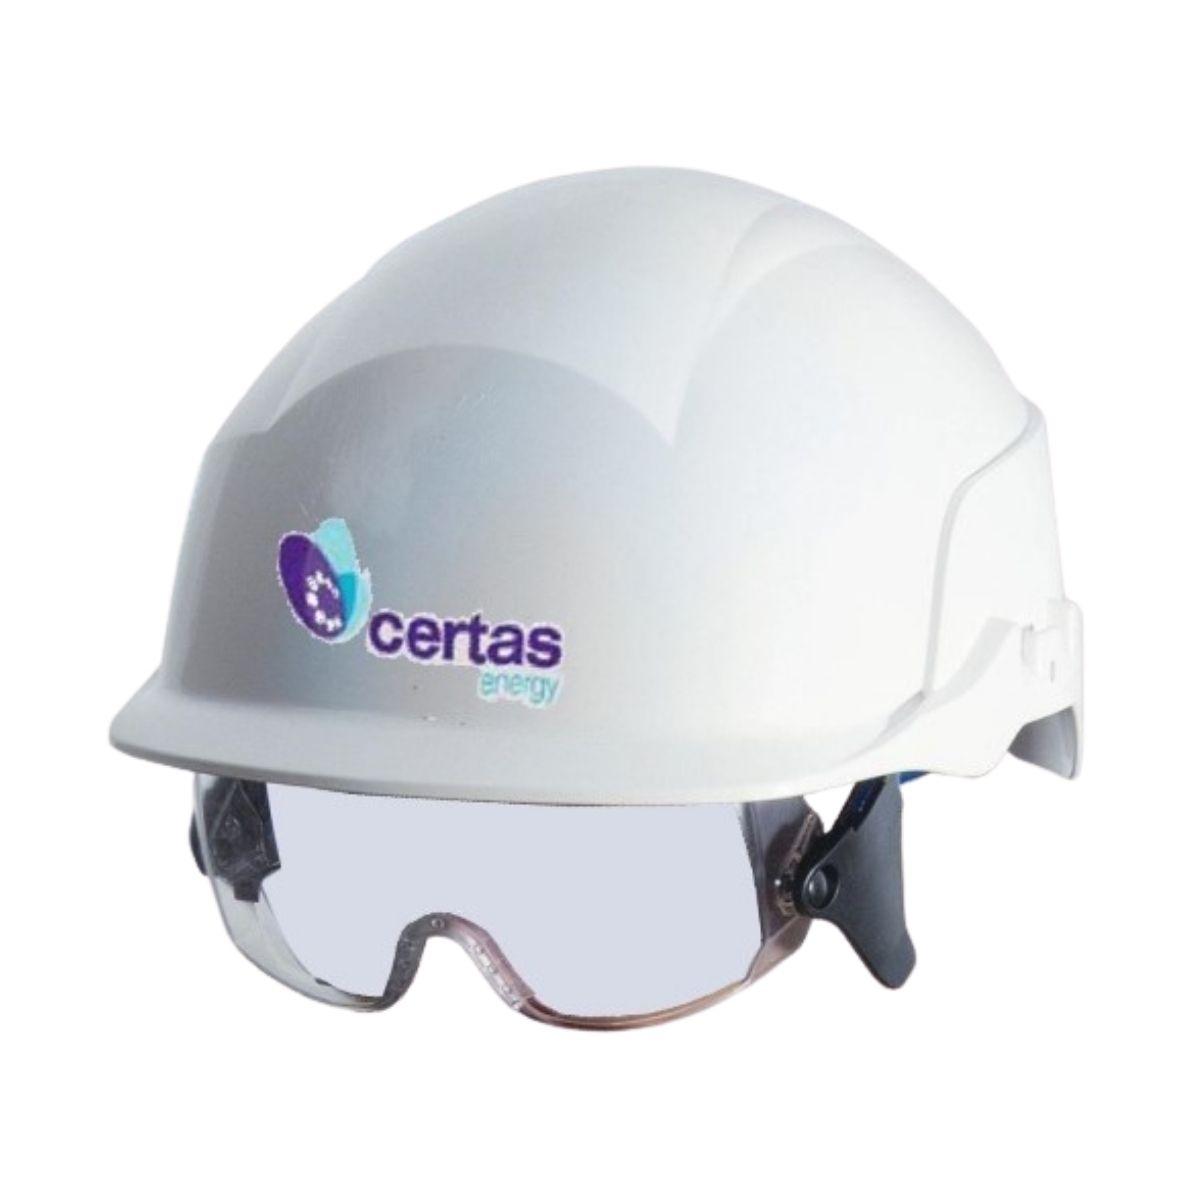 HF0533 Spectrum Safety Helmet & Visor with Certas Logo